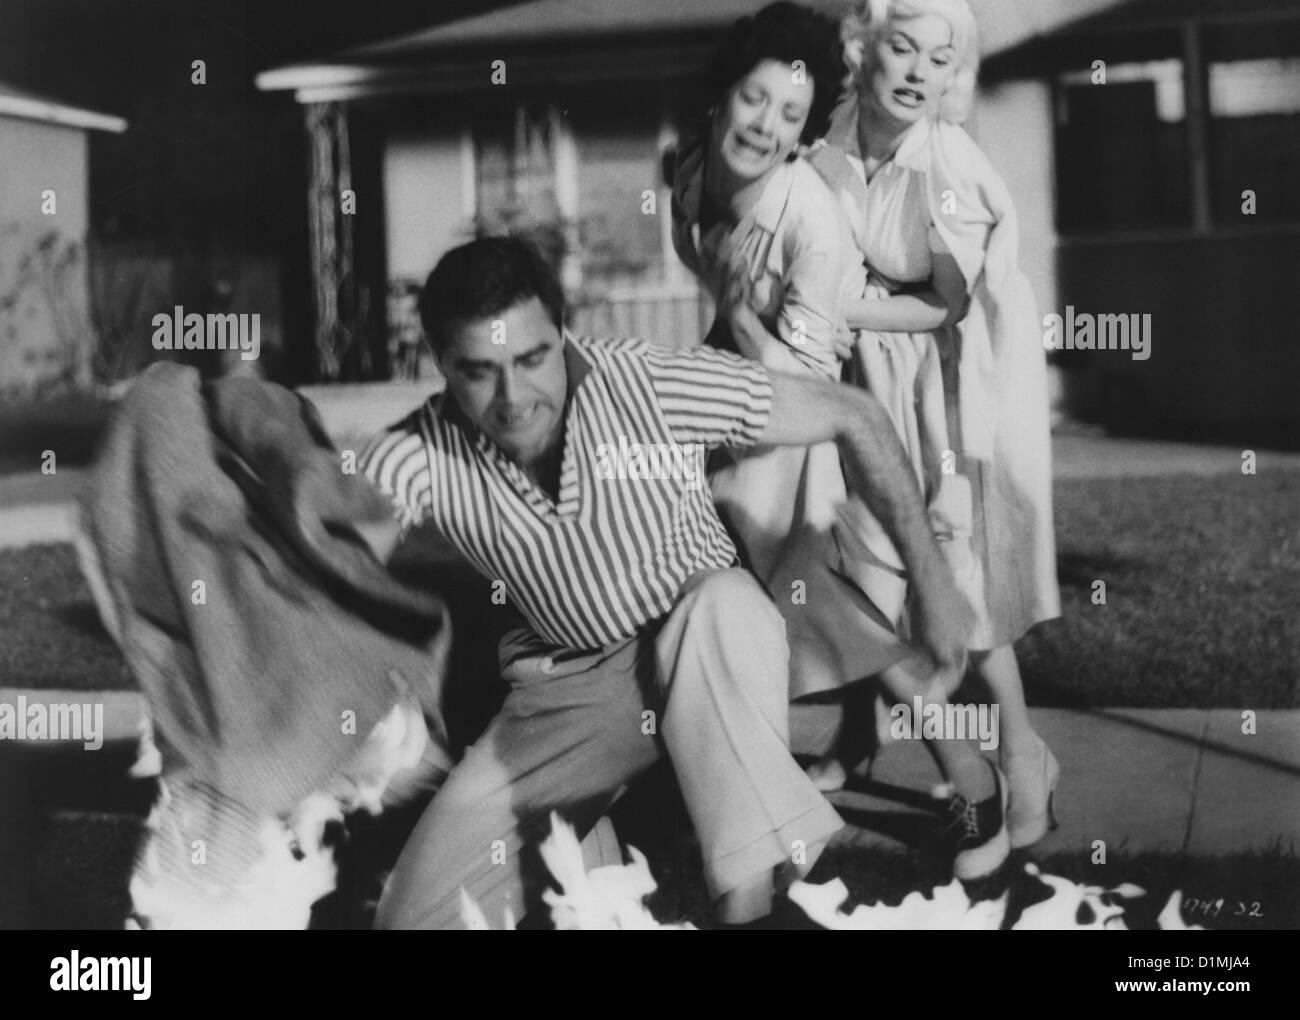 Der Grosse Schwindler   Big Operator, The   Szenenbild  -- - Stock Image